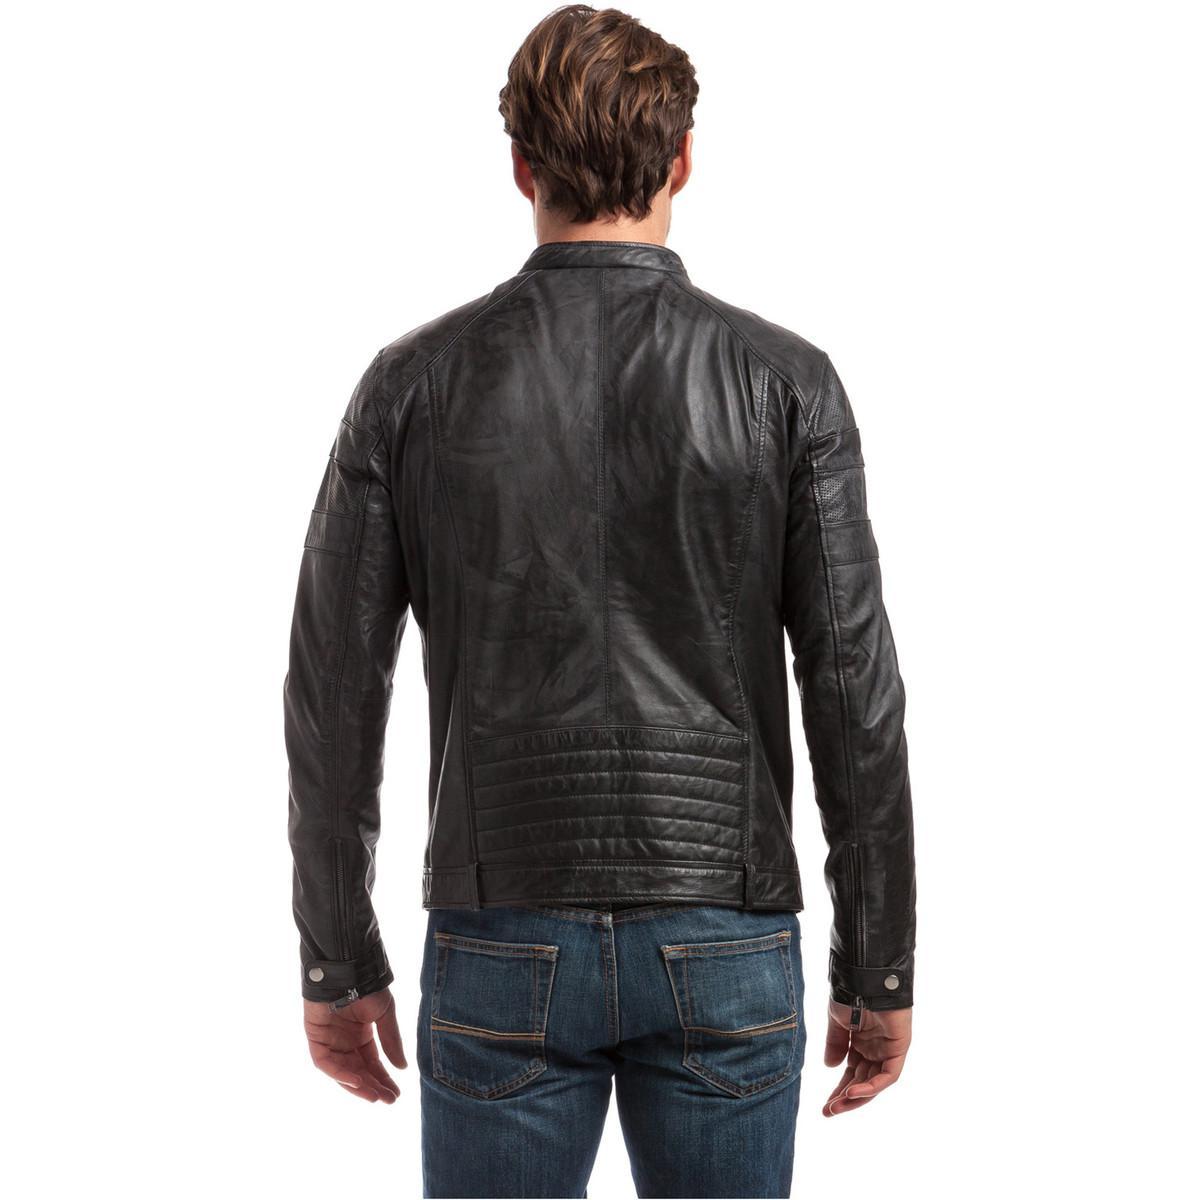 Best Mountain Leather Jacket Clinton Black Men's Leather Jacket In Black for Men